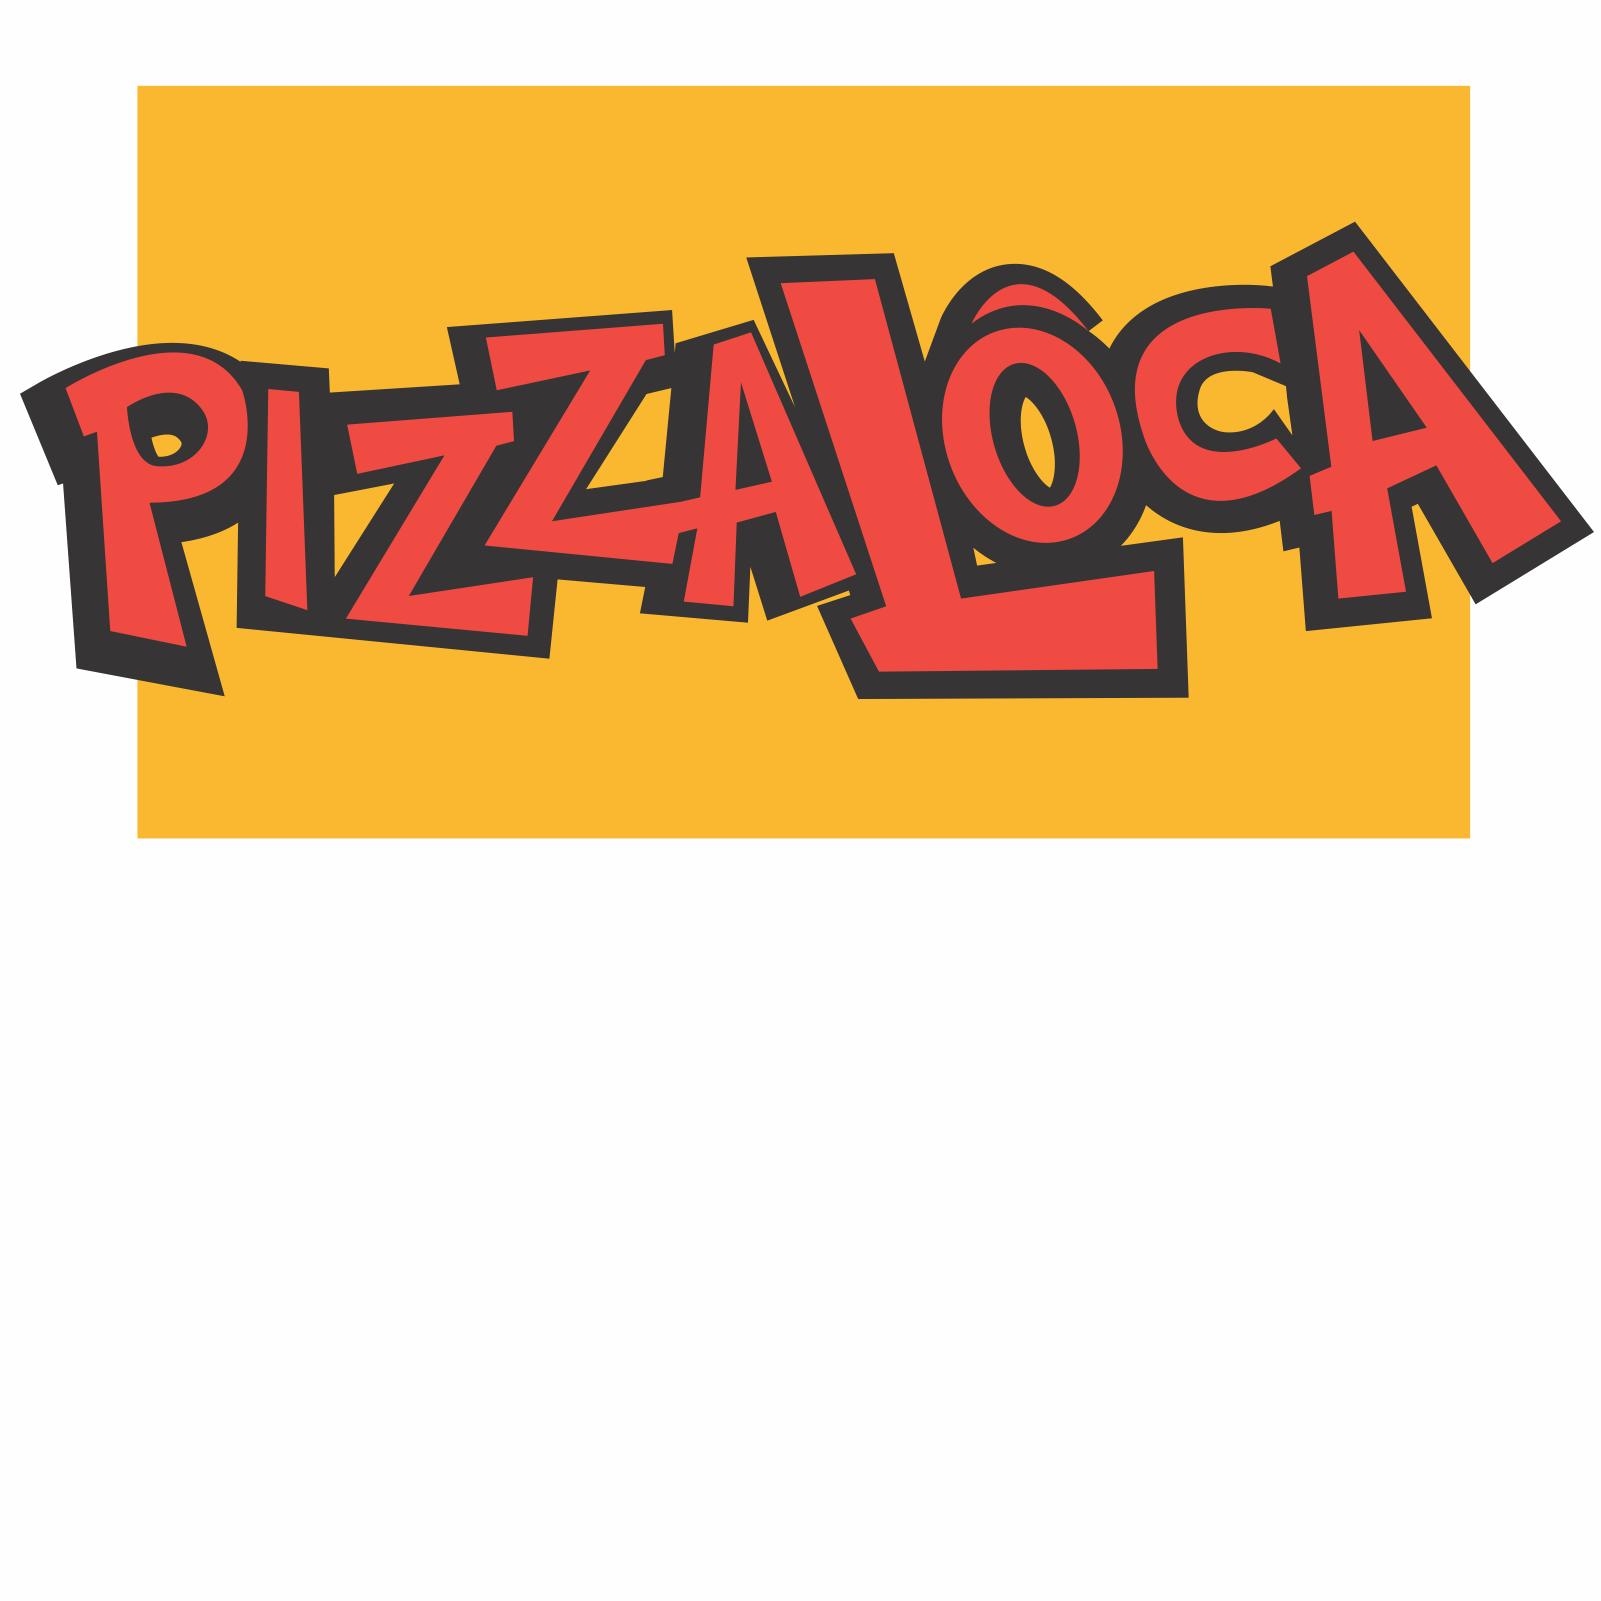 PizzaLôca